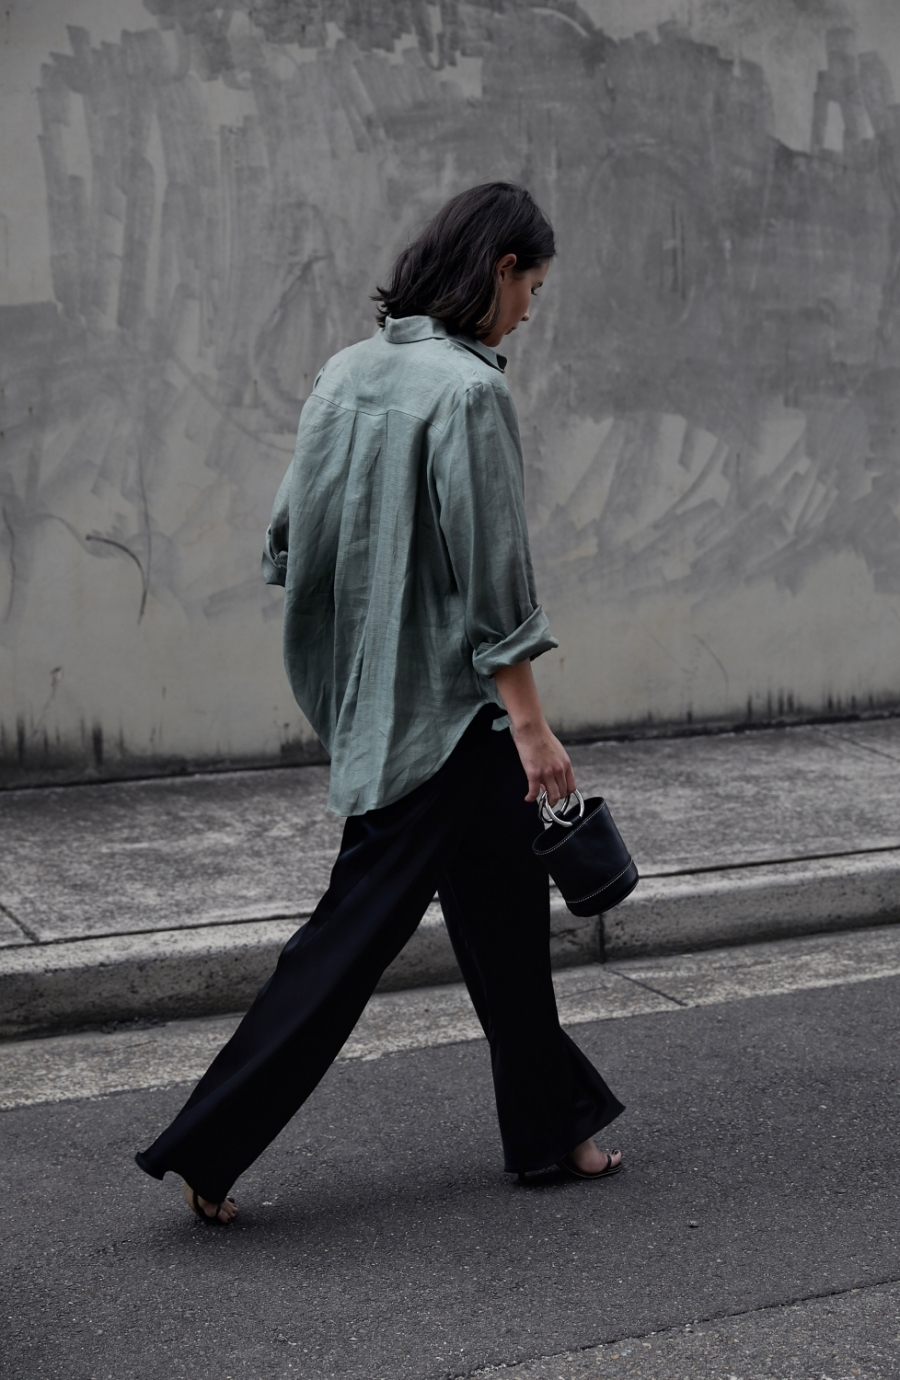 khaki-and-black_simon-miller-bag_australian-fashion-blogger_harperandharley_2-n6j279nao7txr1fqk0wl7qk48ucel0182m8dy8eqqw.jpg